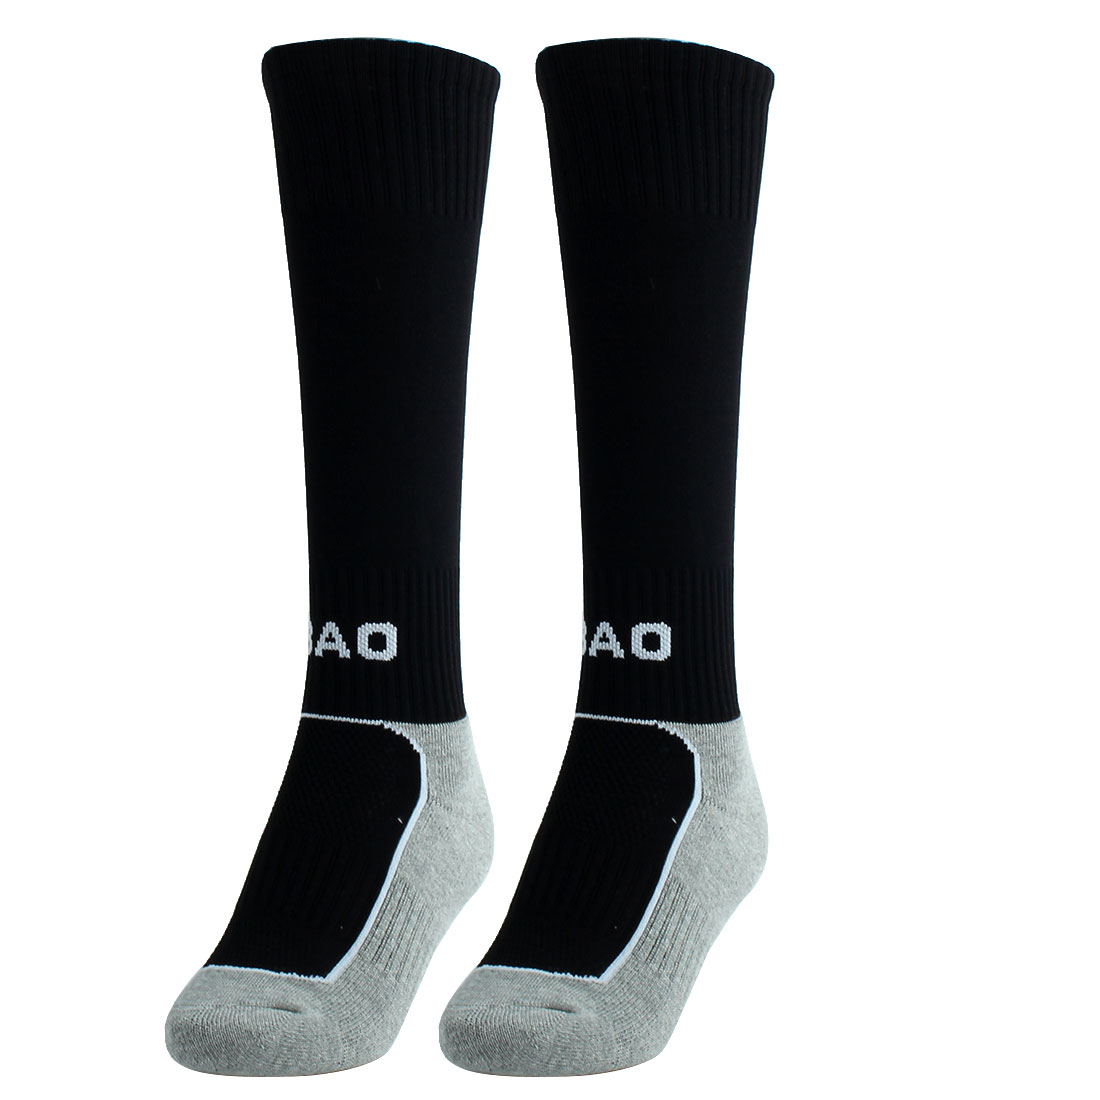 R-BAO Authorized Outdoor Sports Soccer Football Long Socks Black Pair